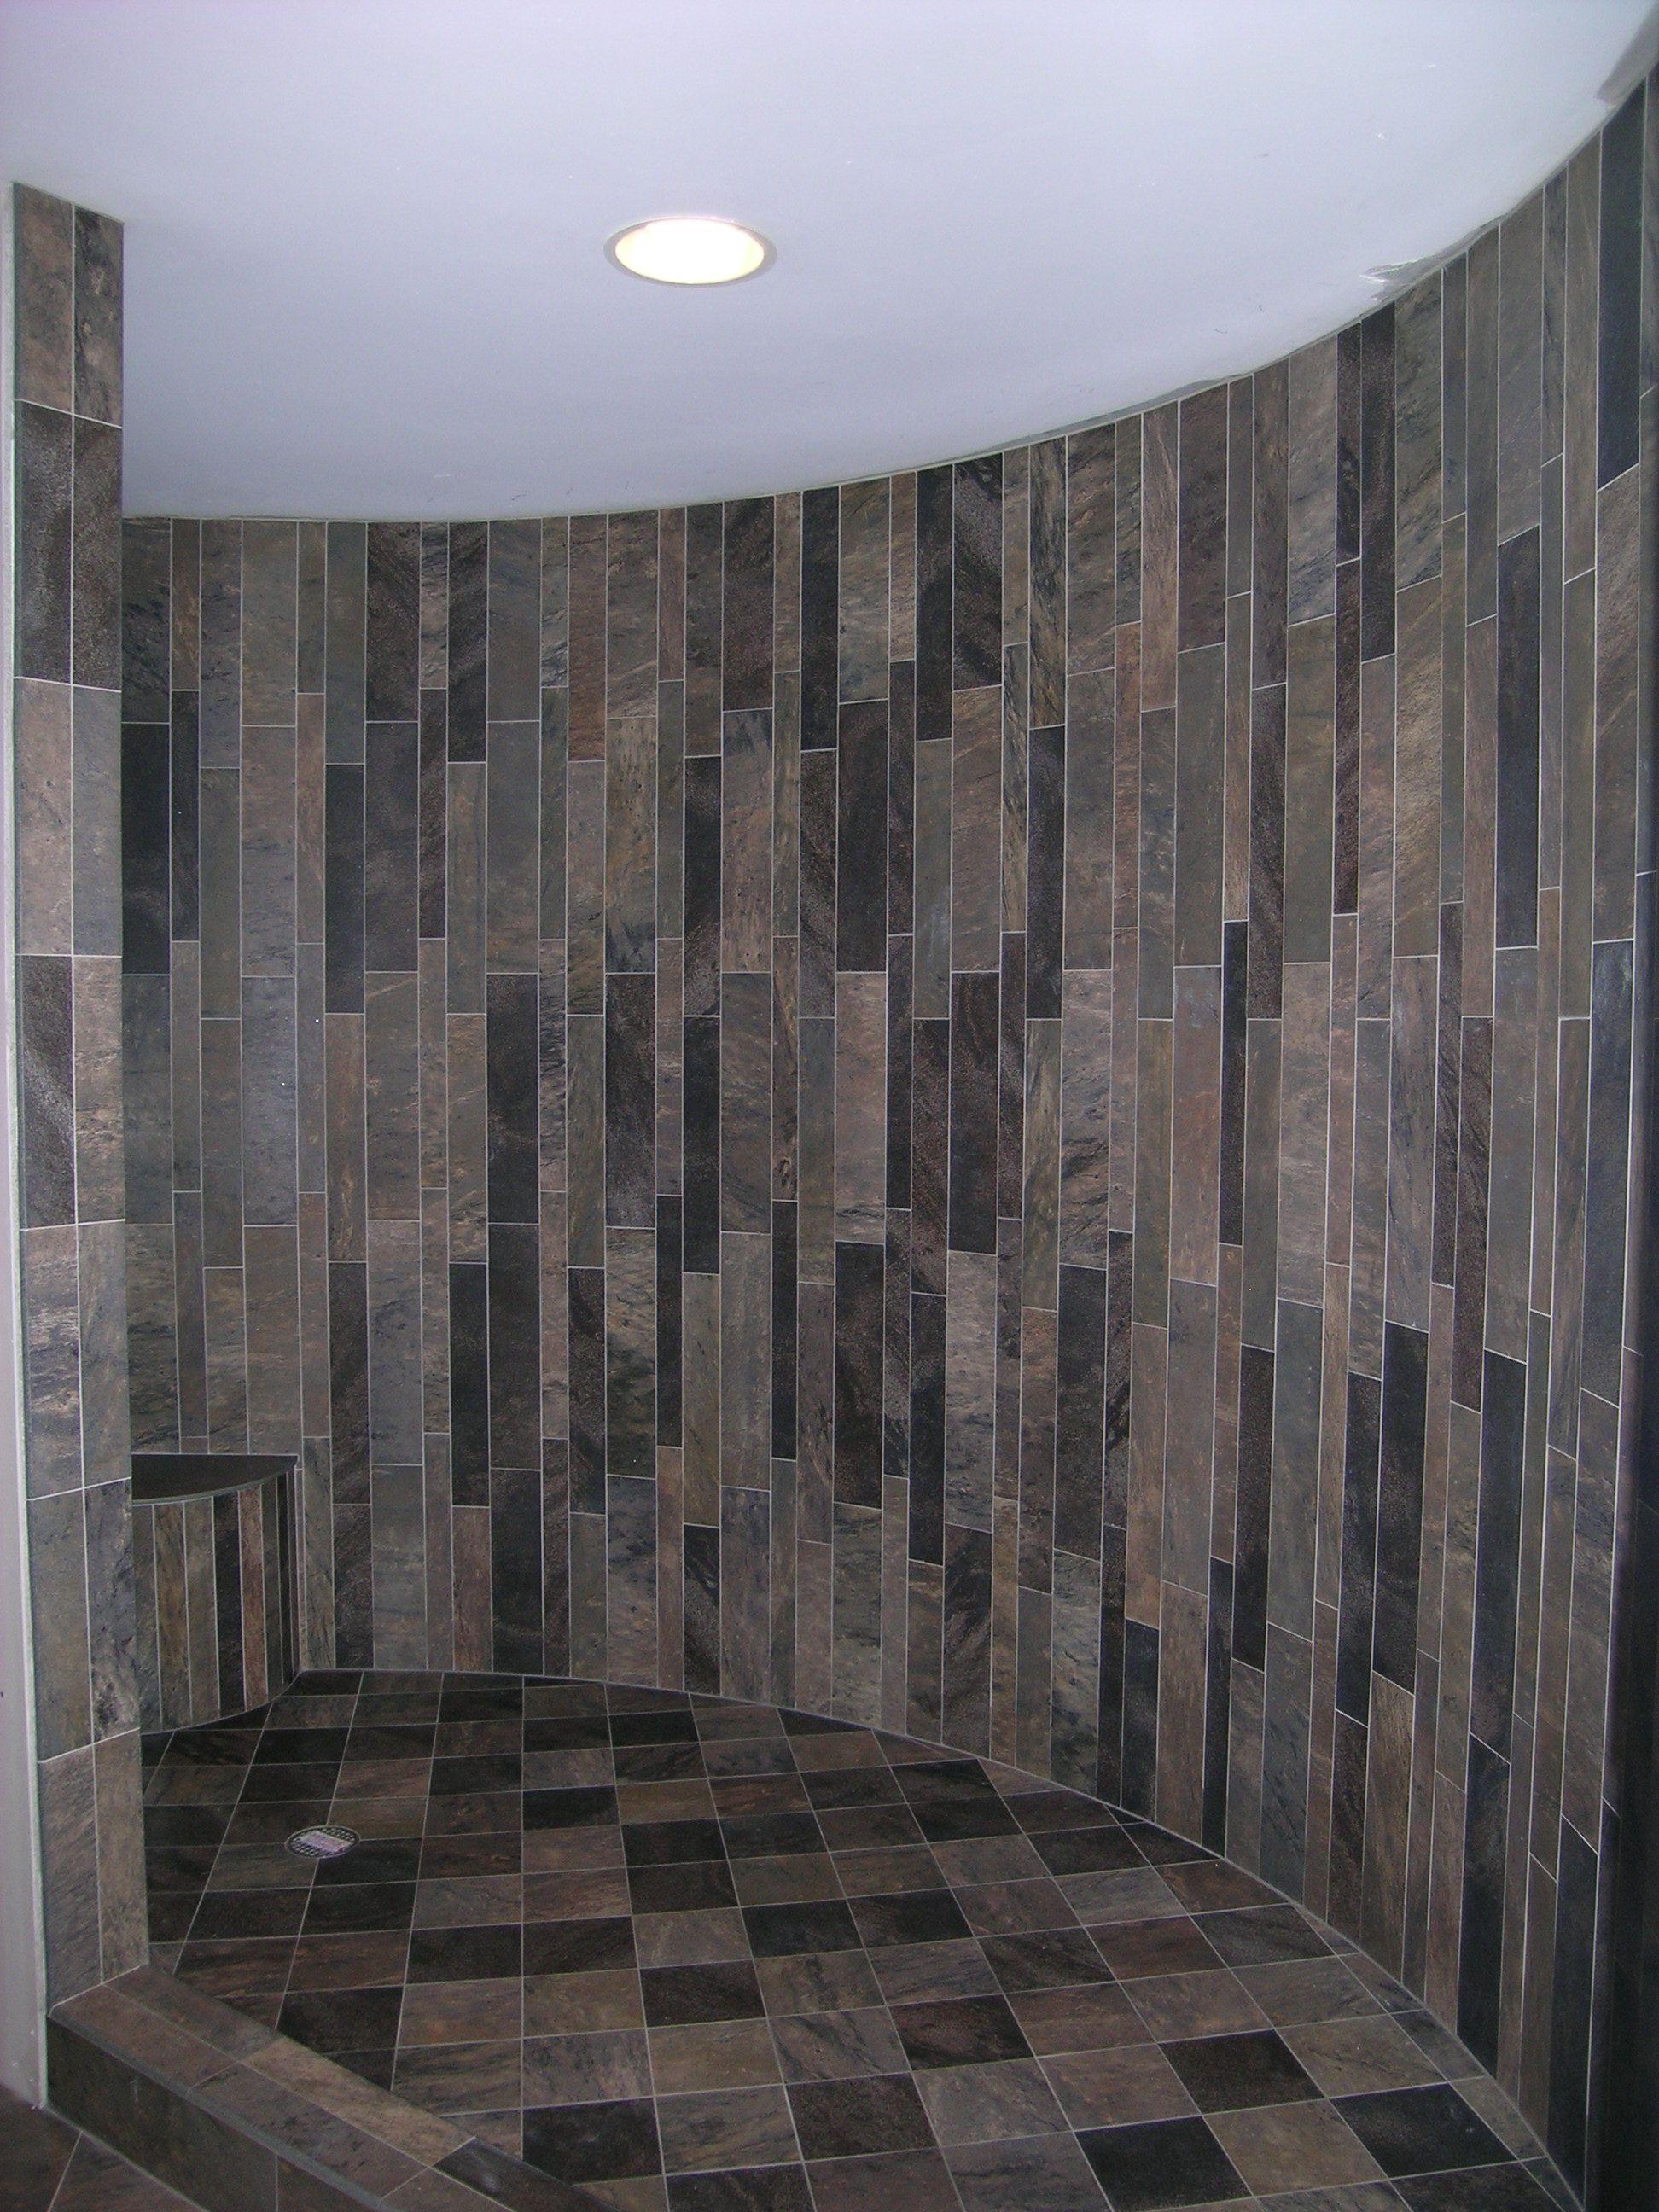 How Can I Design My Bathroom